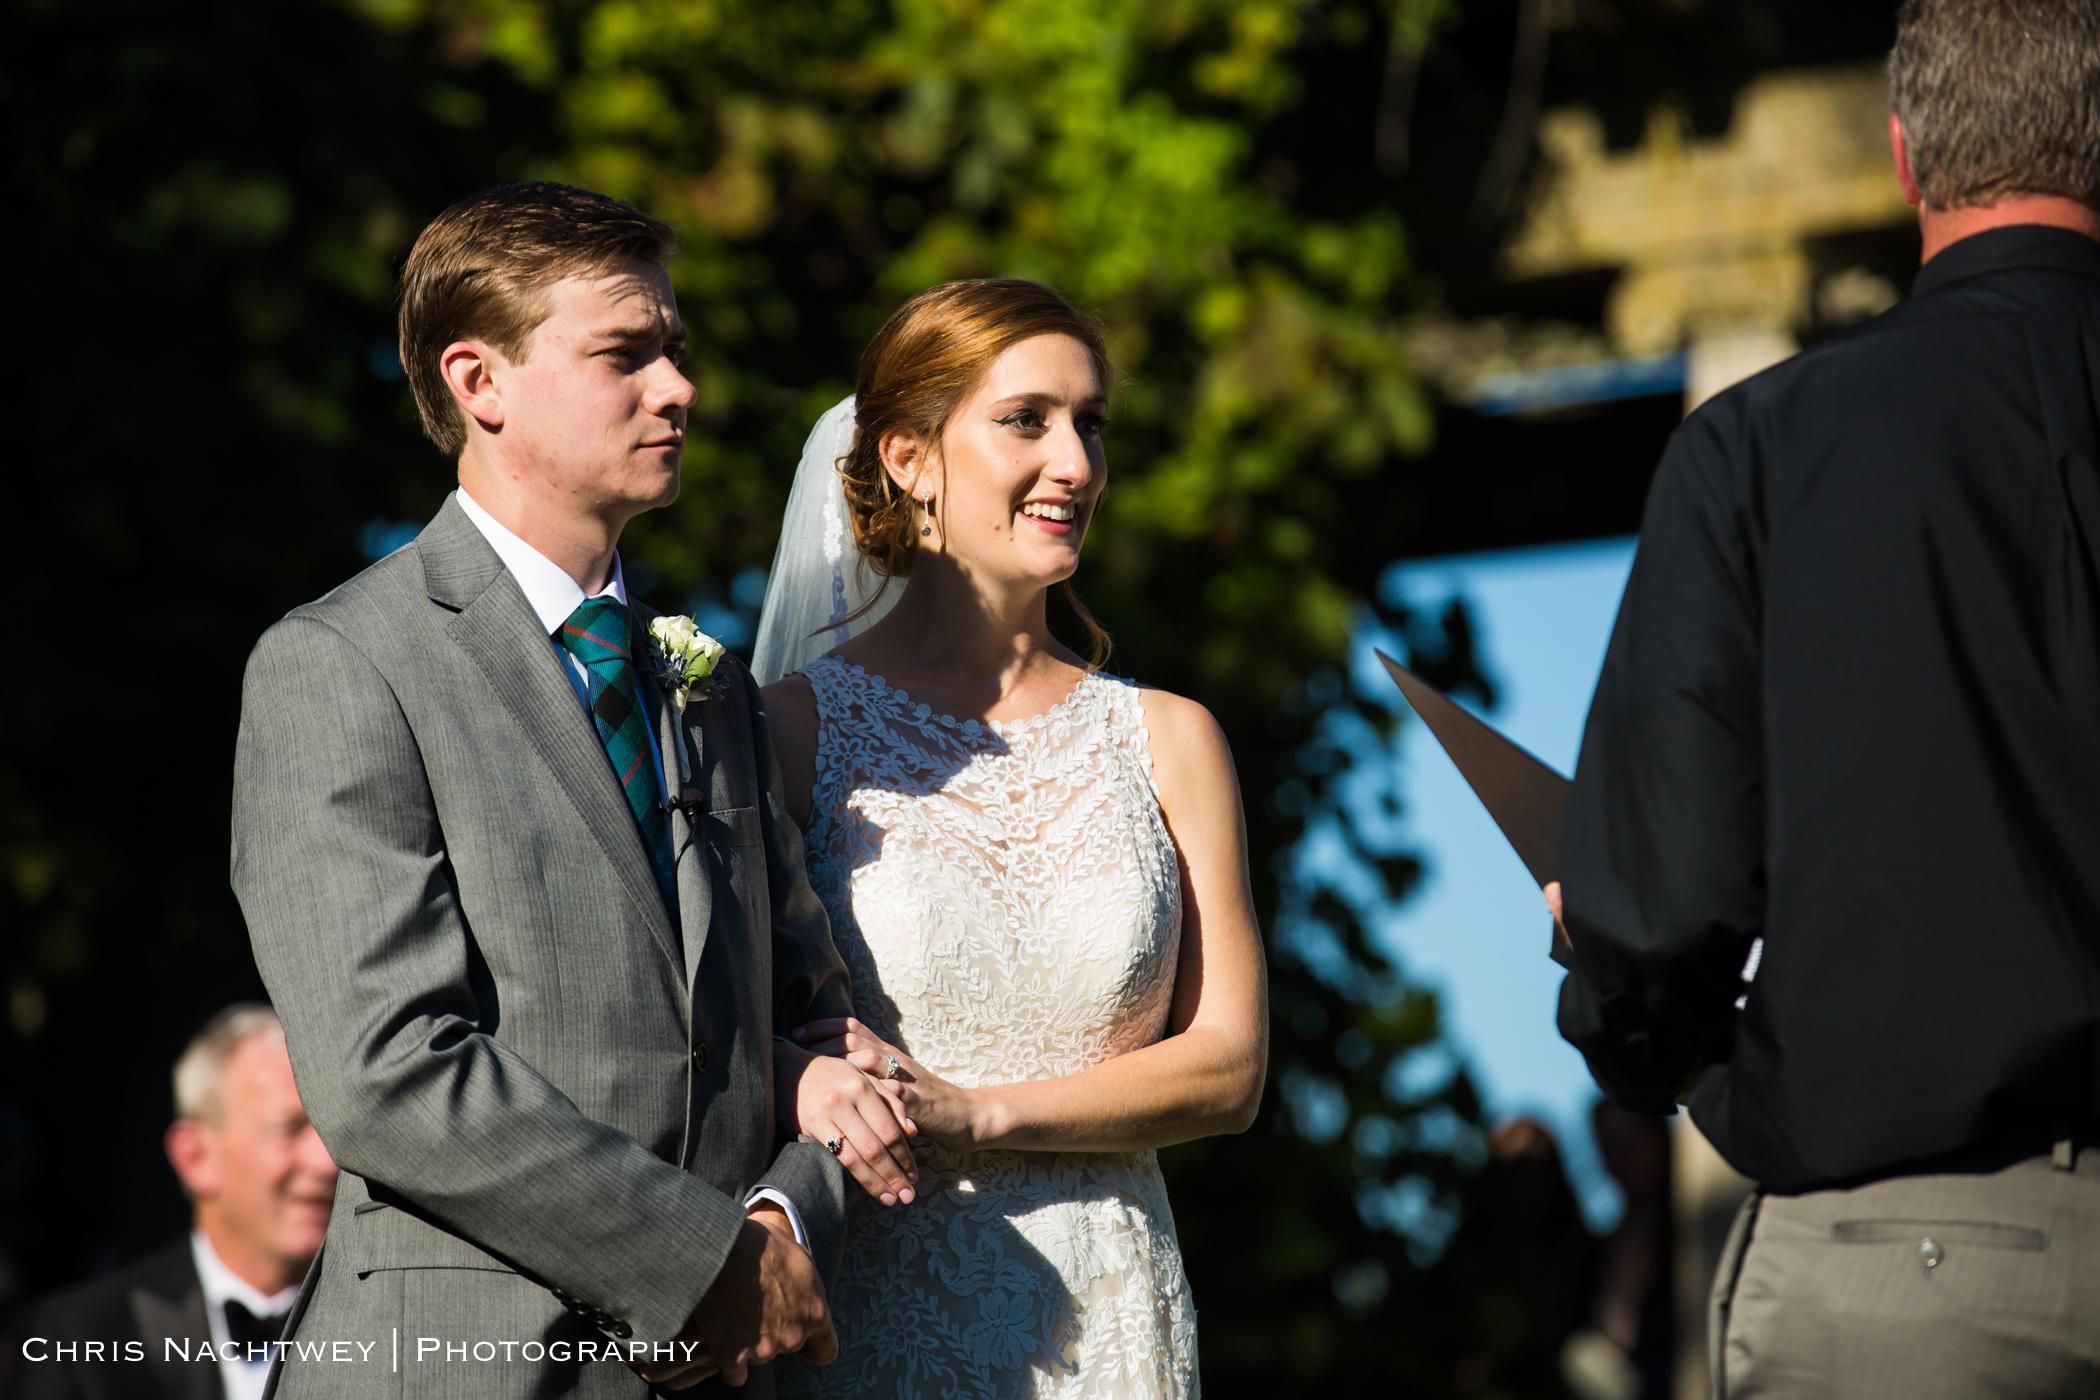 harkness-wedding-photos-chris-nachtwey-photography-2018-12.jpg